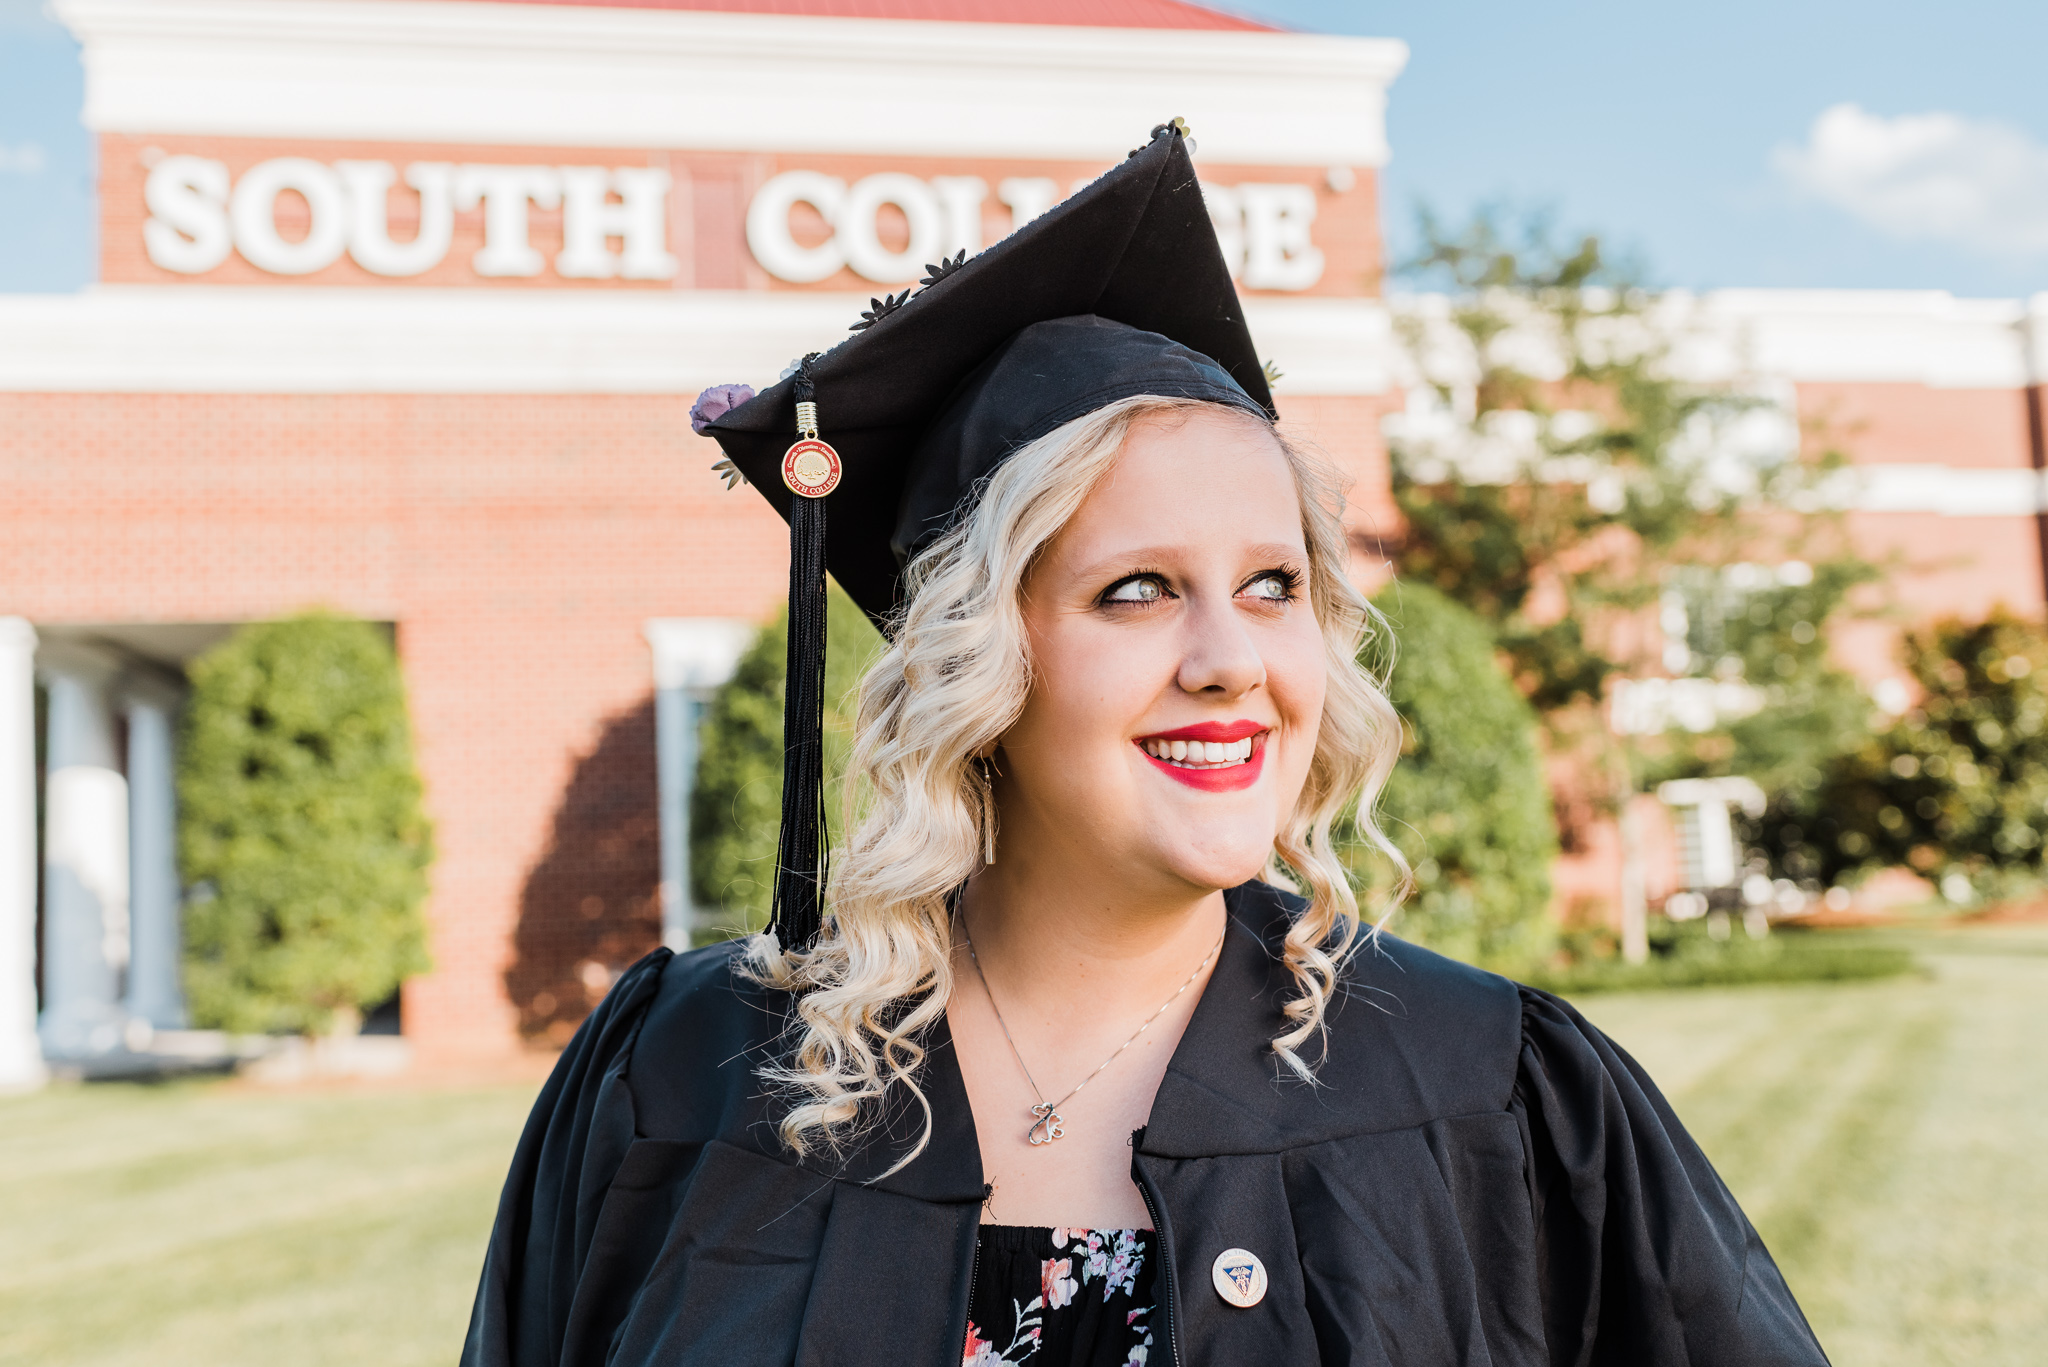 south college senior